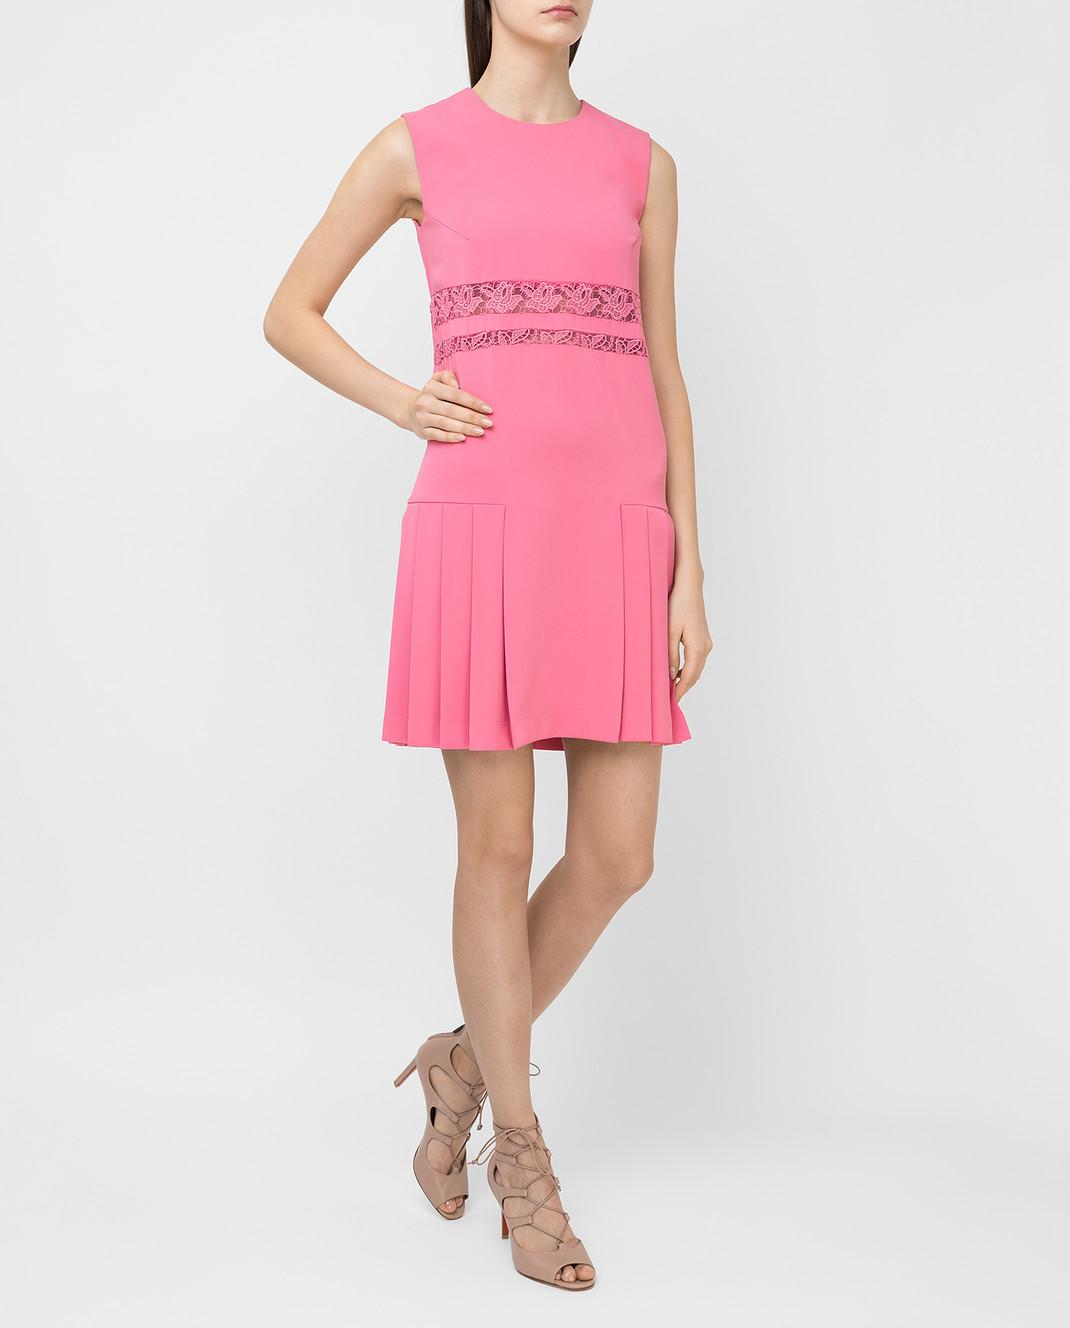 Ermanno Scervino Розовое платье изображение 2